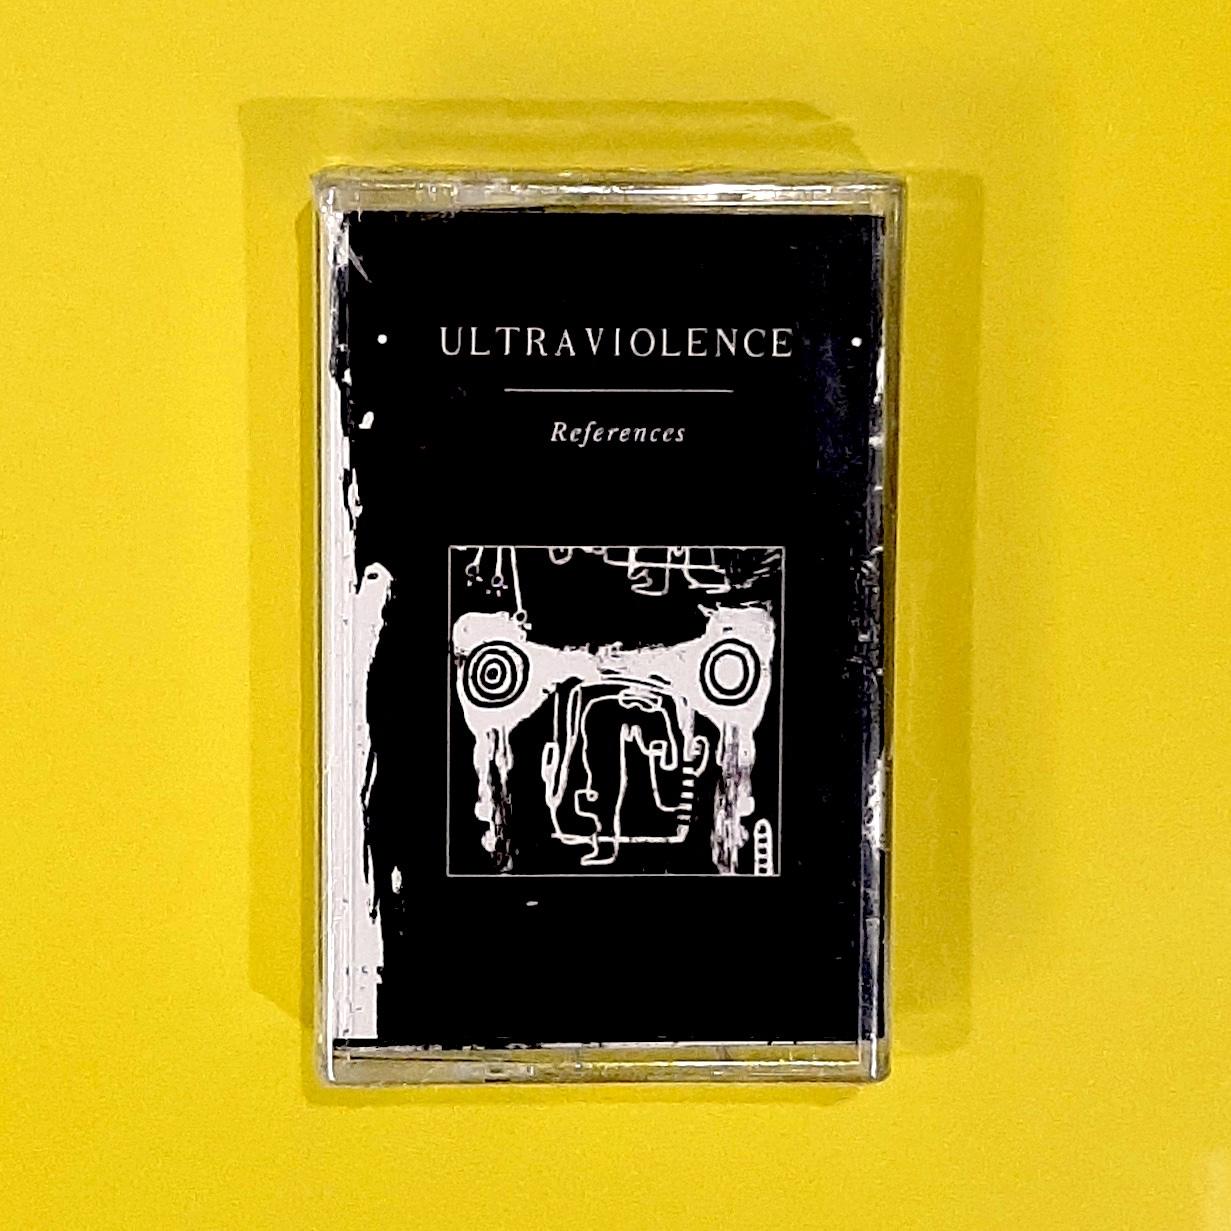 Ultraviolence - References (Gerpfast Records)